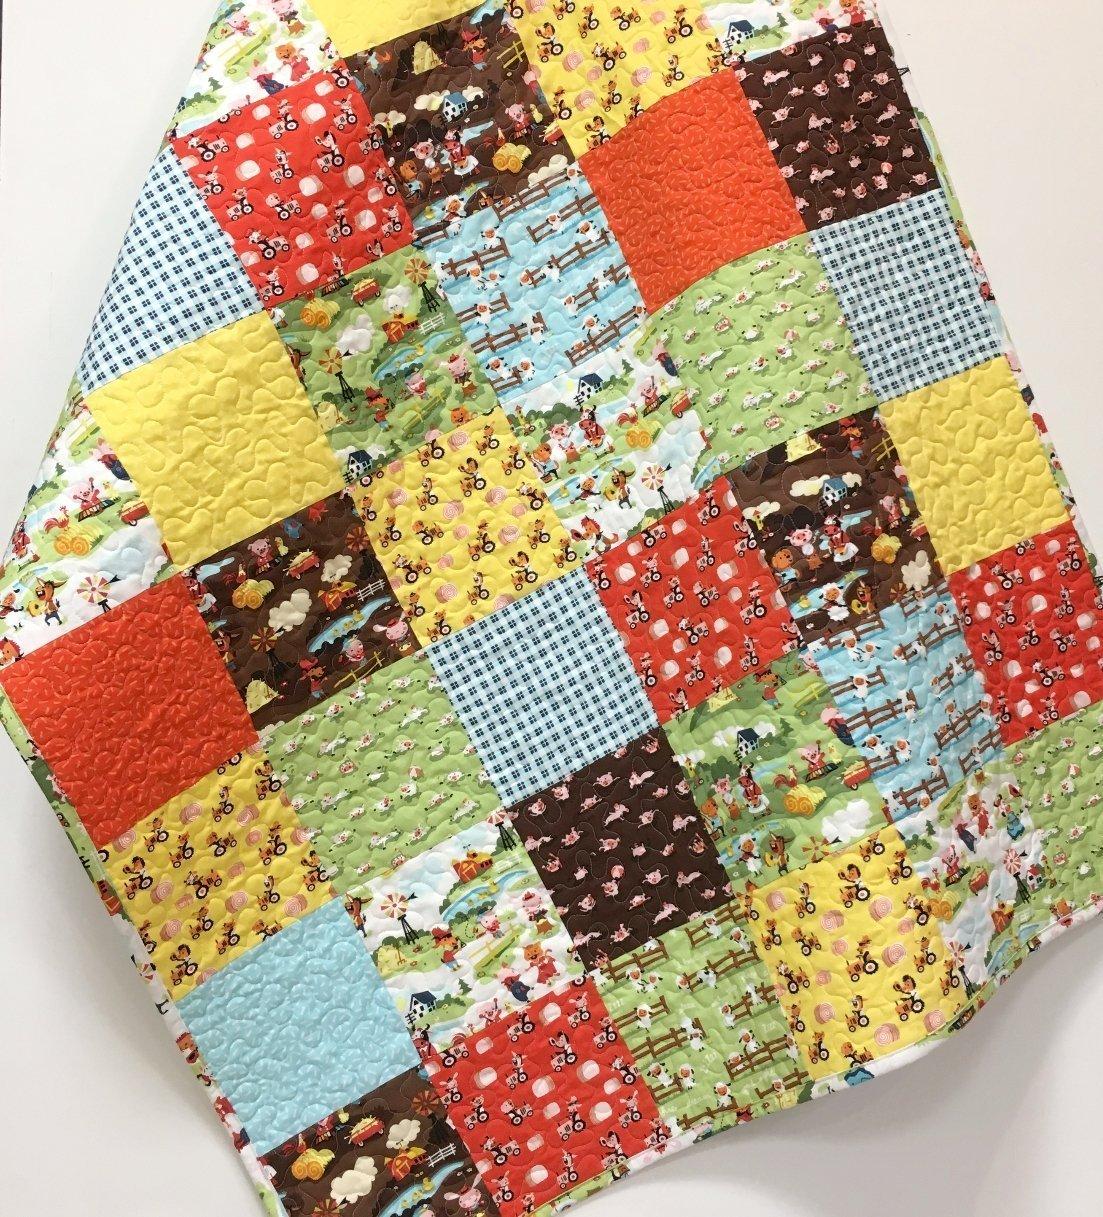 Farm Boy Baby Quilt Country Nursery Crib Bedding Patchwork Handmade